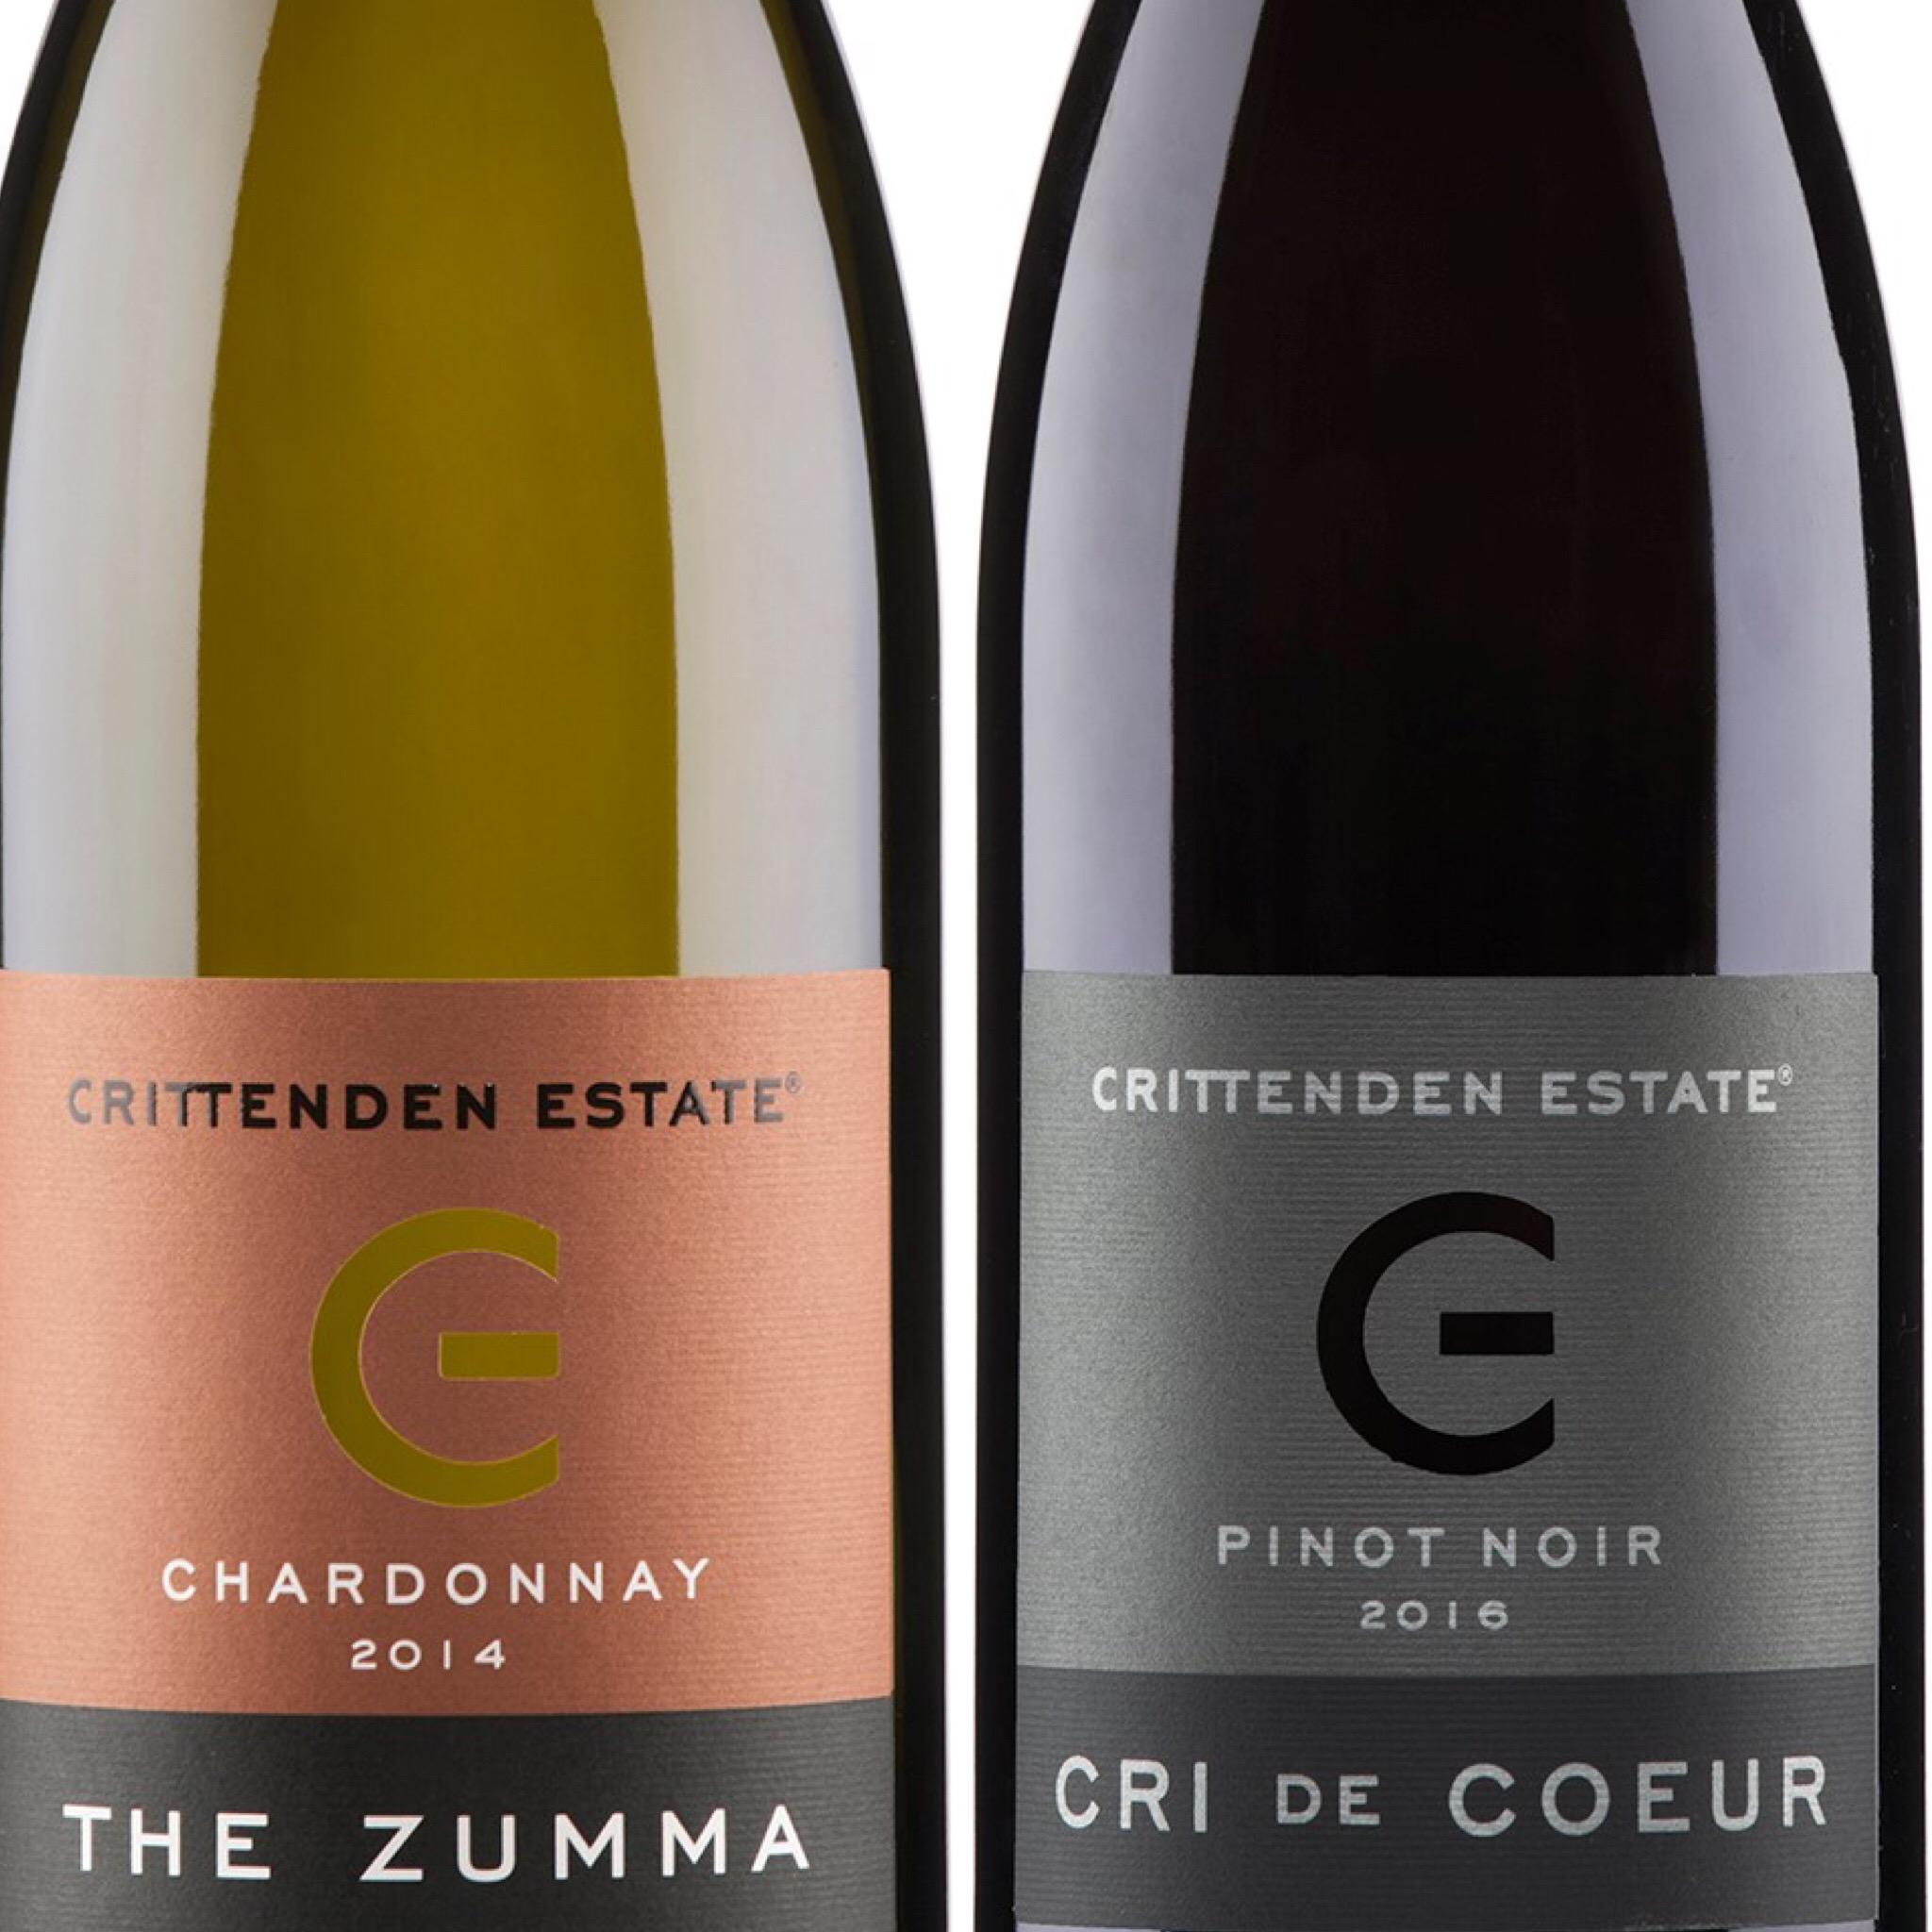 (Image: Wine Australia)